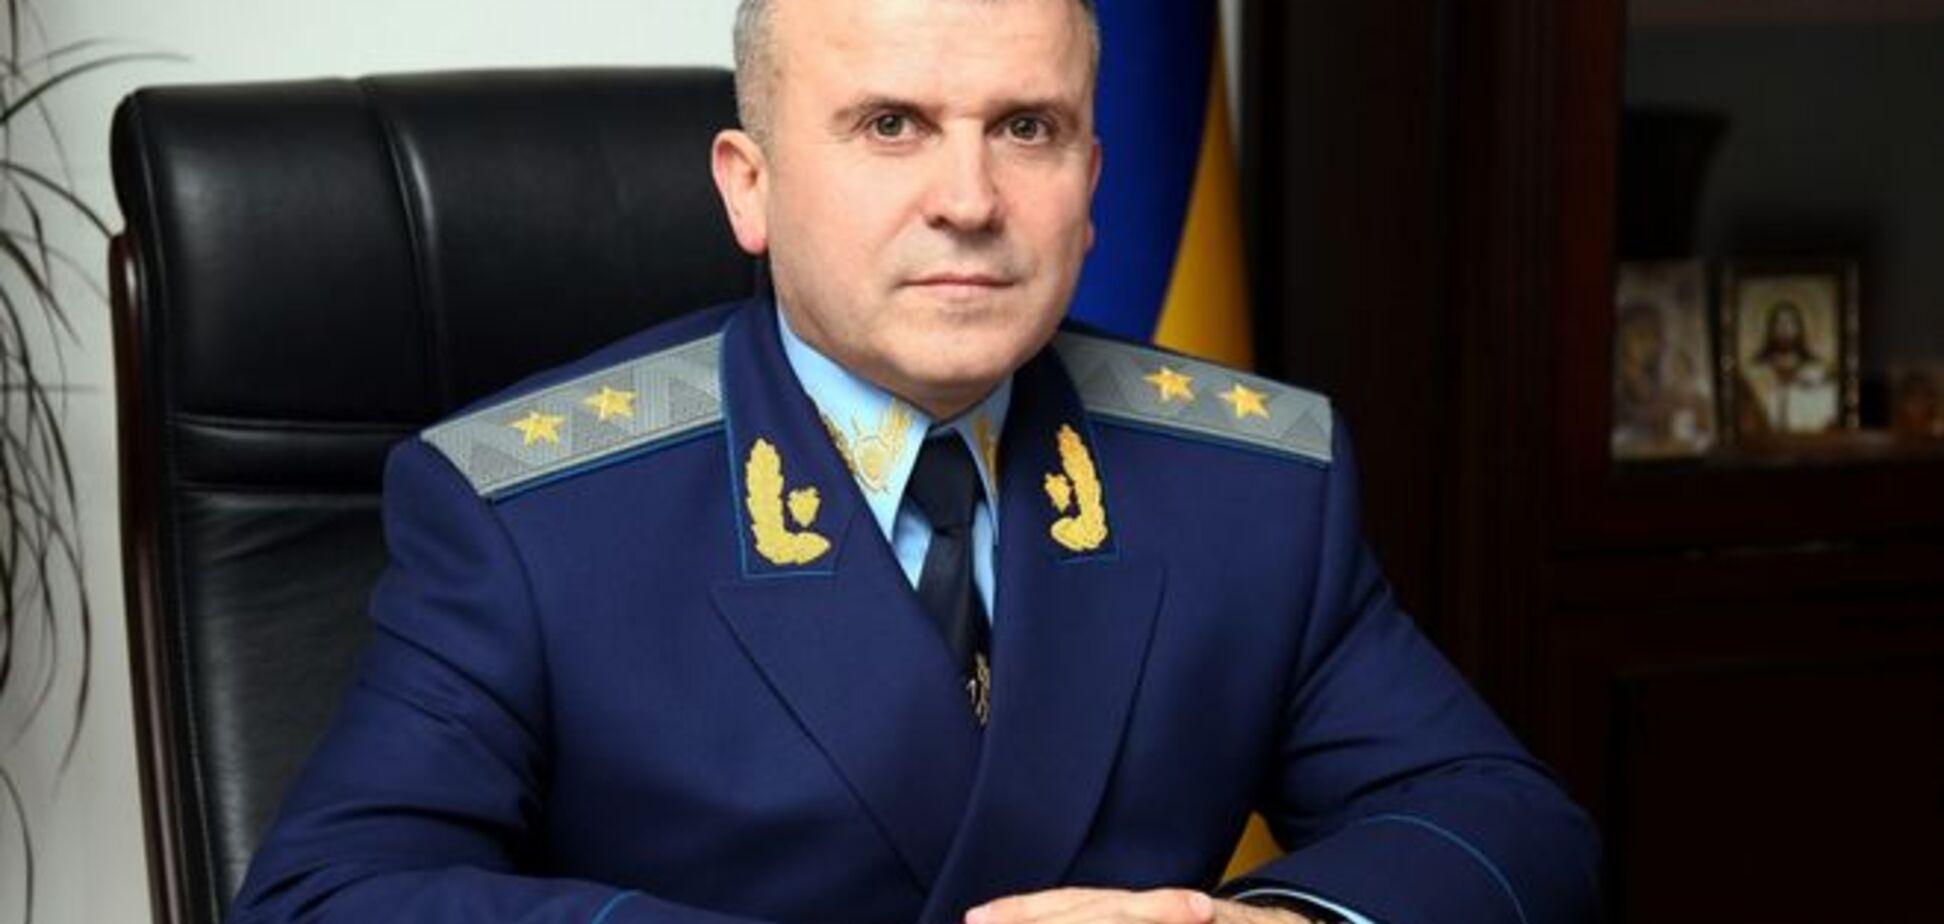 Команда Януковича причастна к организации аннексии Крыма - ГПУ